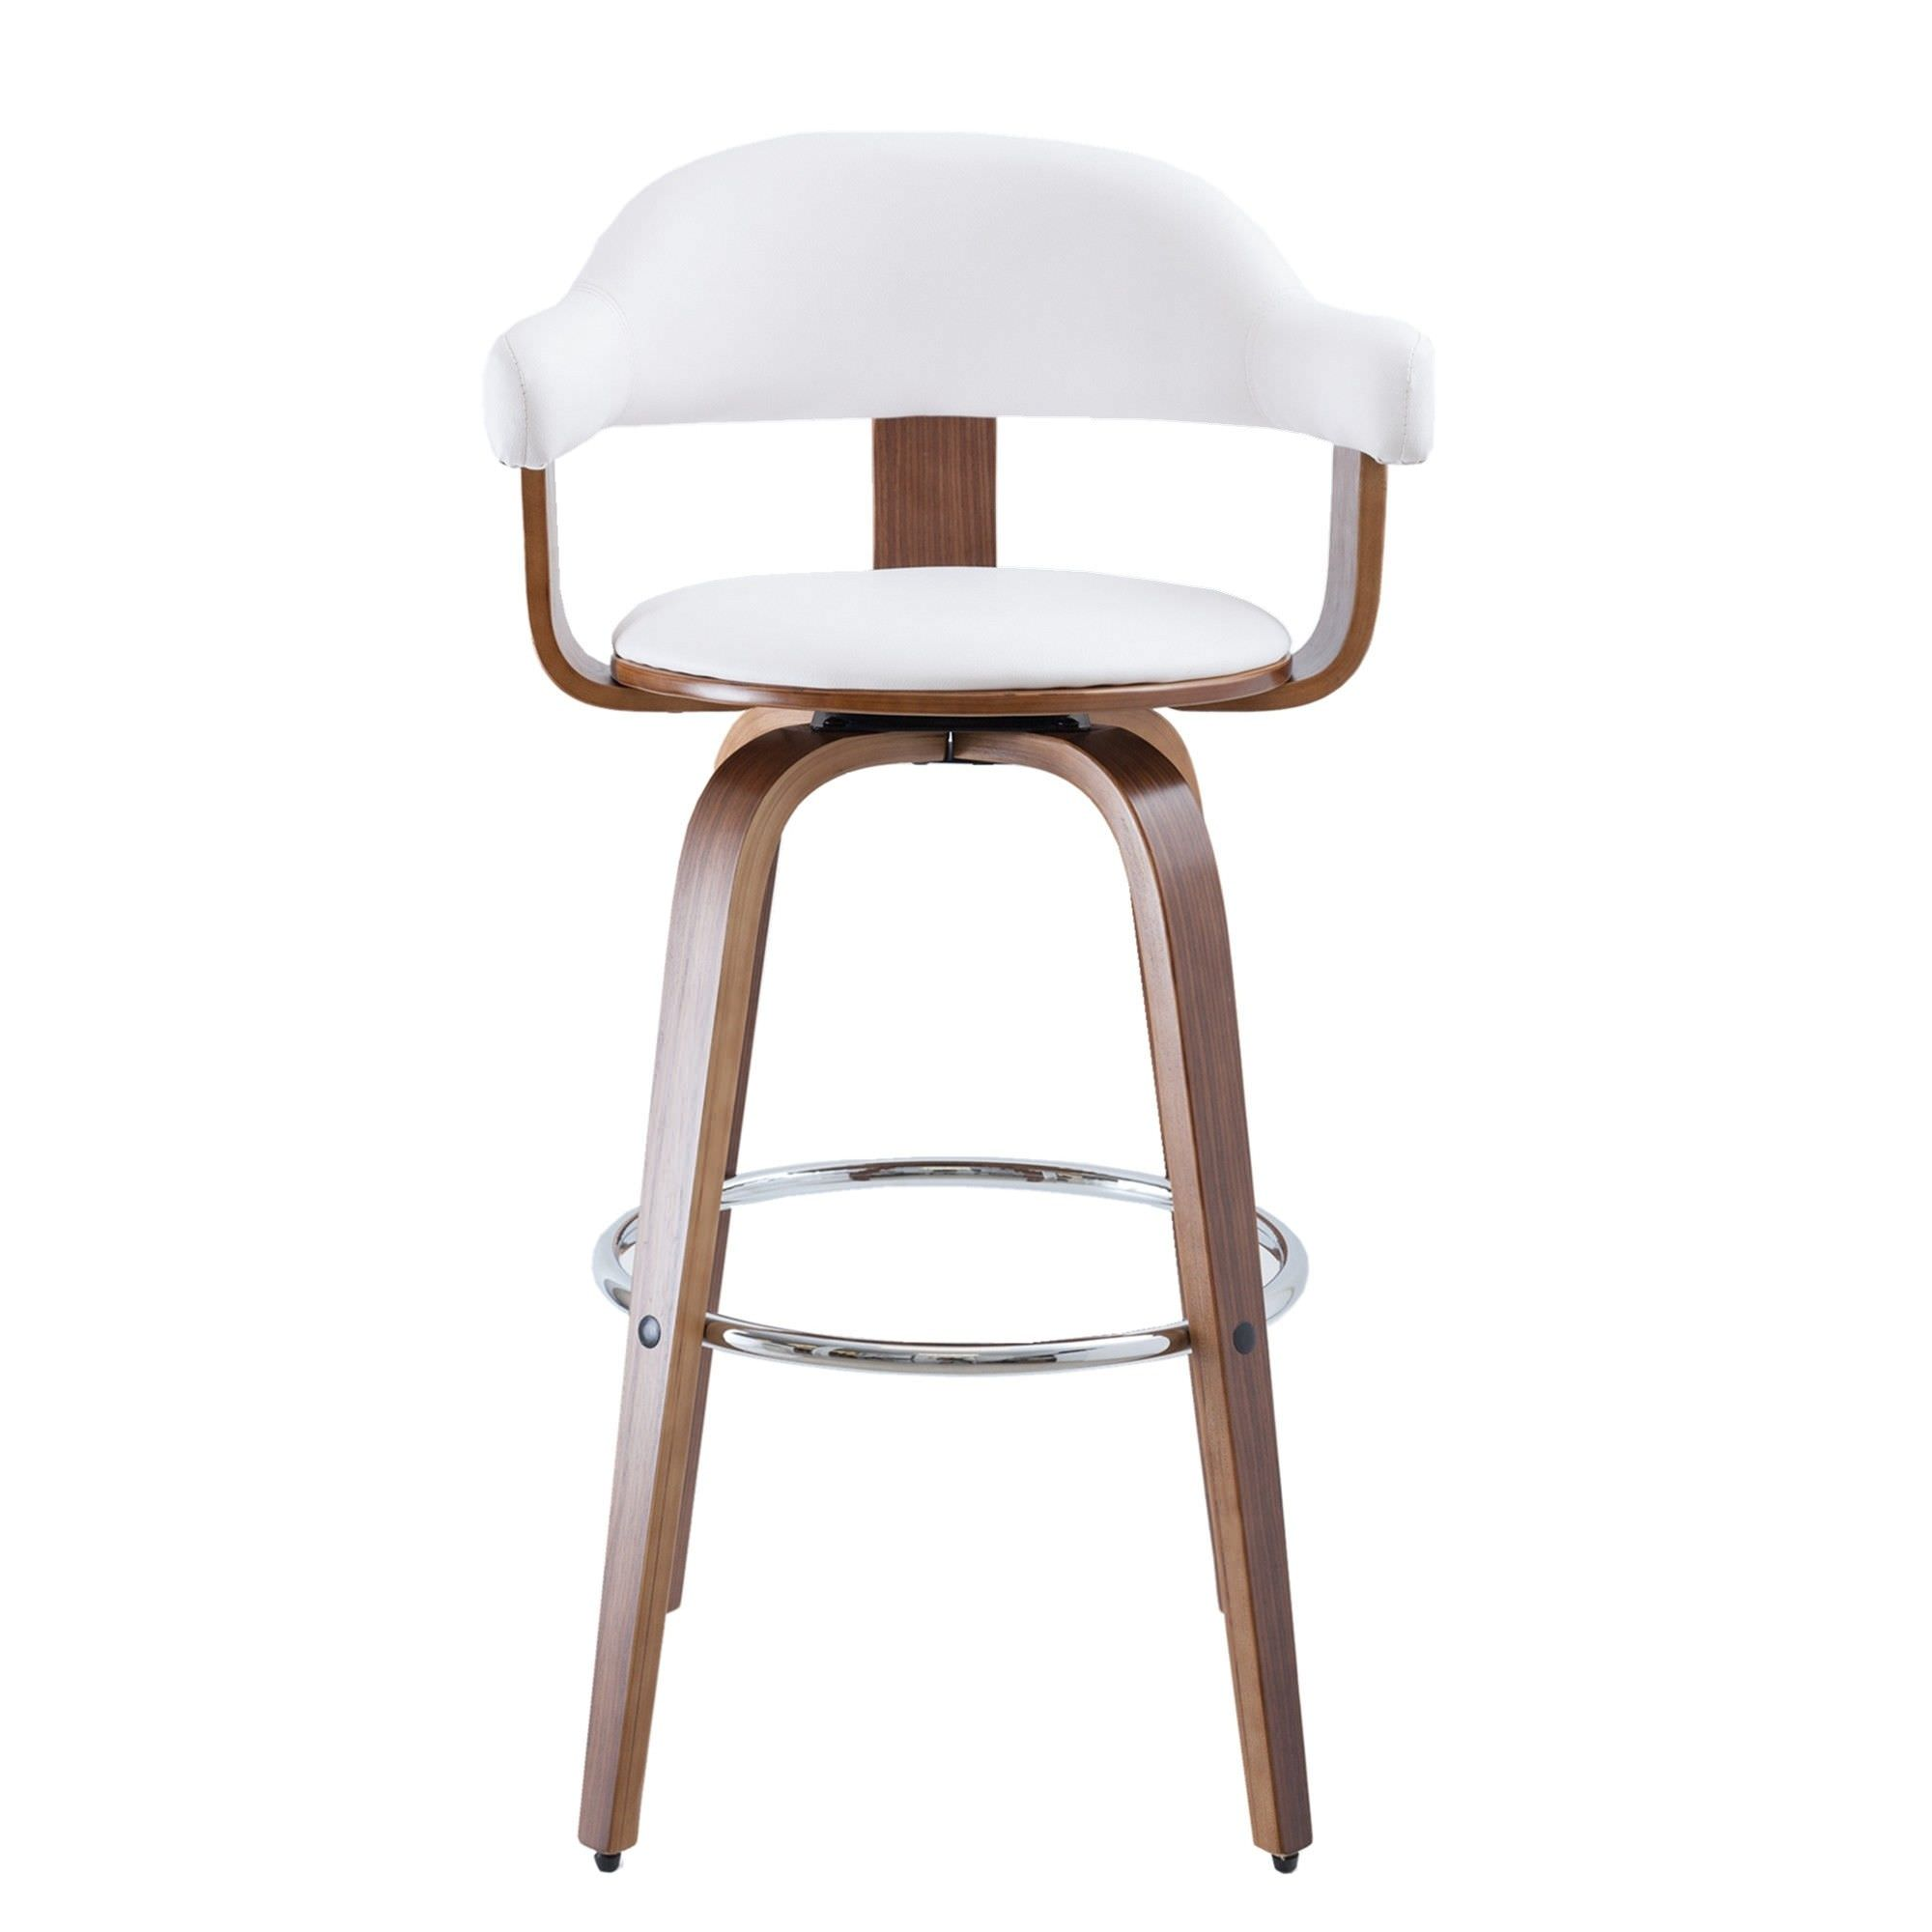 Millan Bentwood Swivel Bar Chair, White / Walnut